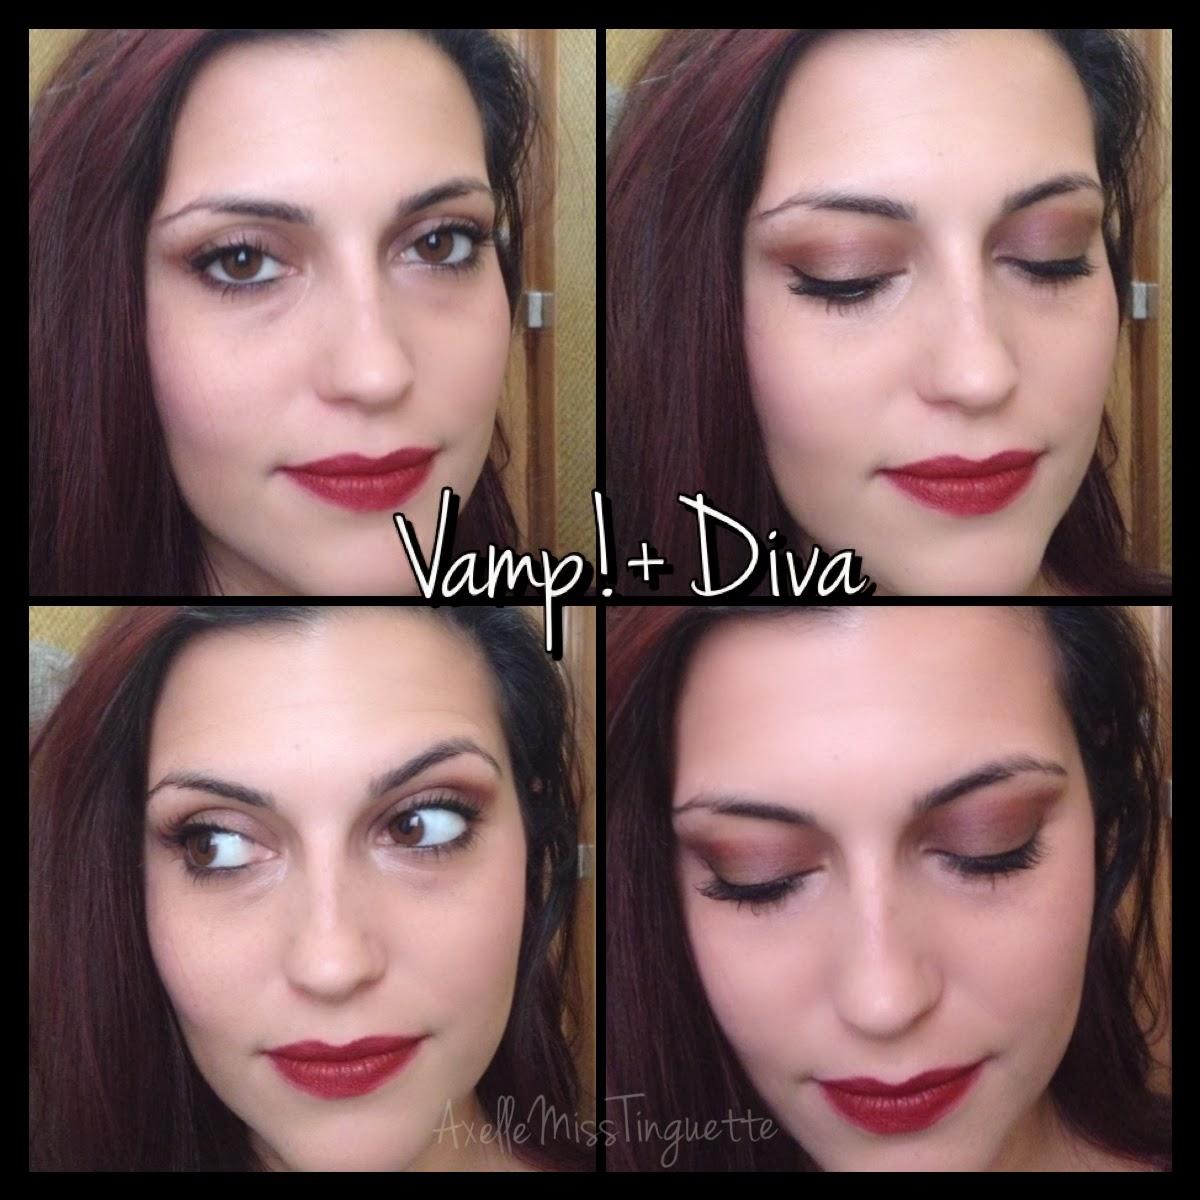 Axellemisstinguette last weekly makeup 2013 - Rossetto mac diva ...